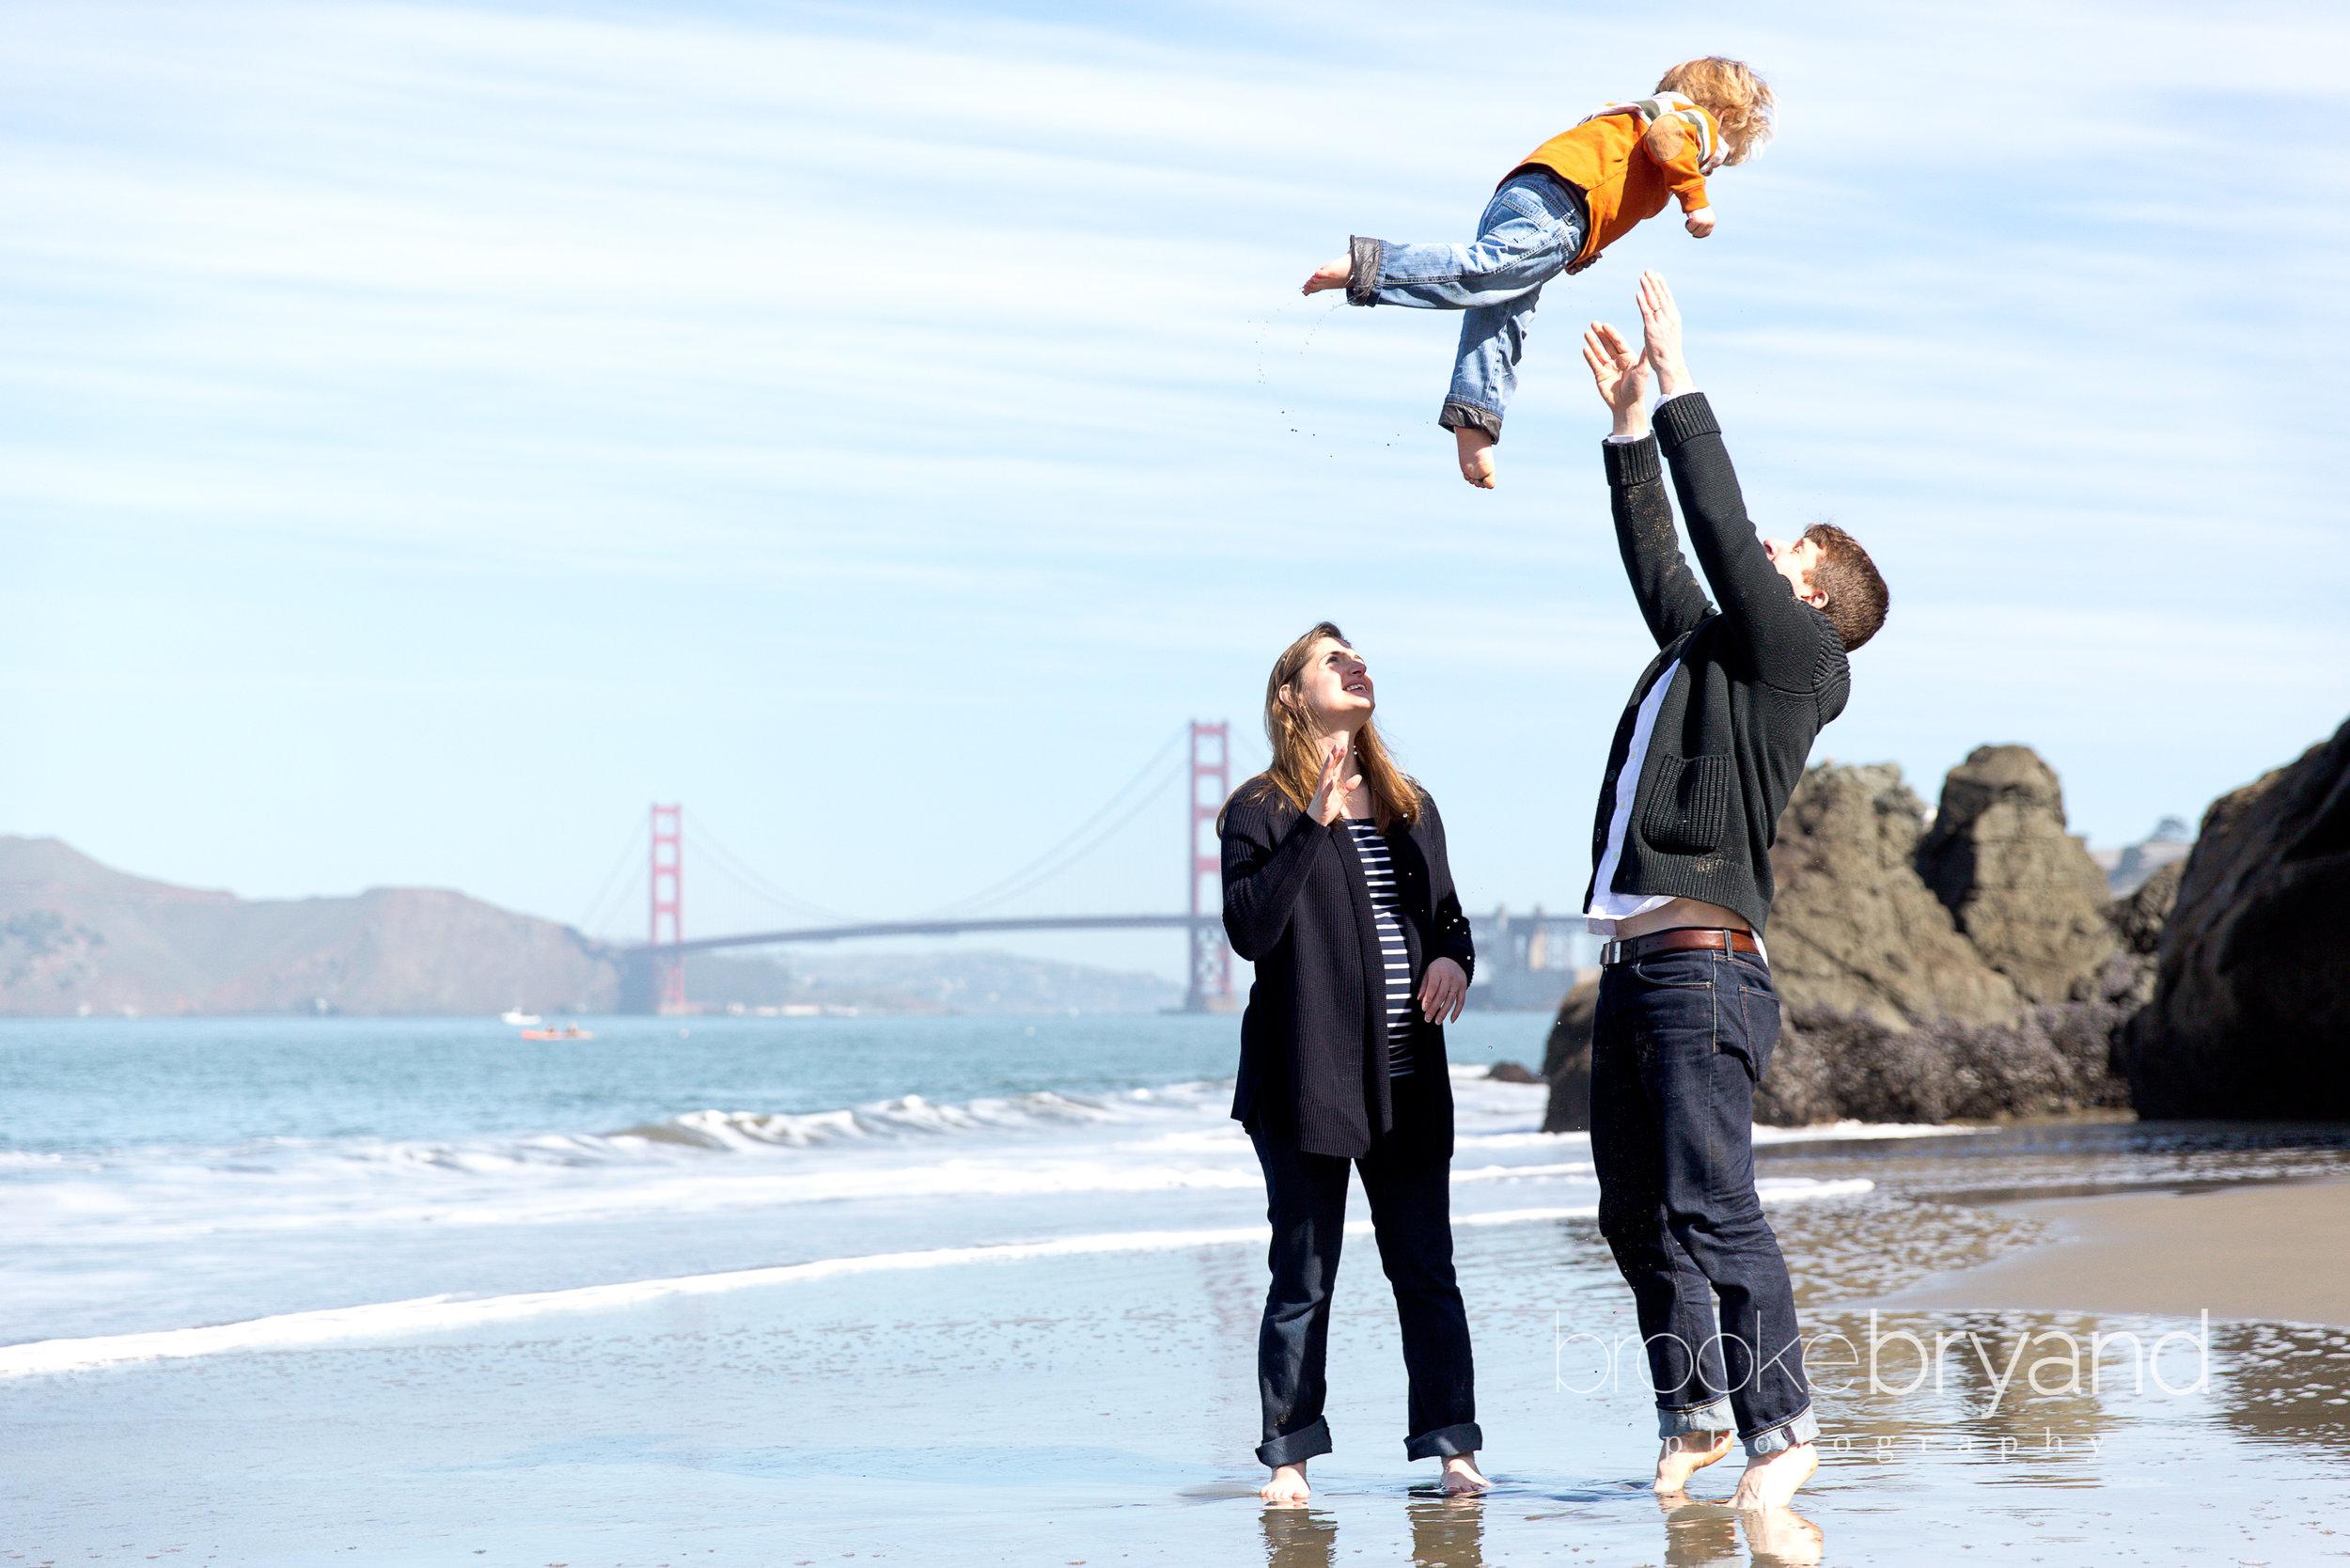 BBP_Roche_Maternity_San-Francisco-Maternity-Photographer-6-0349.jpg